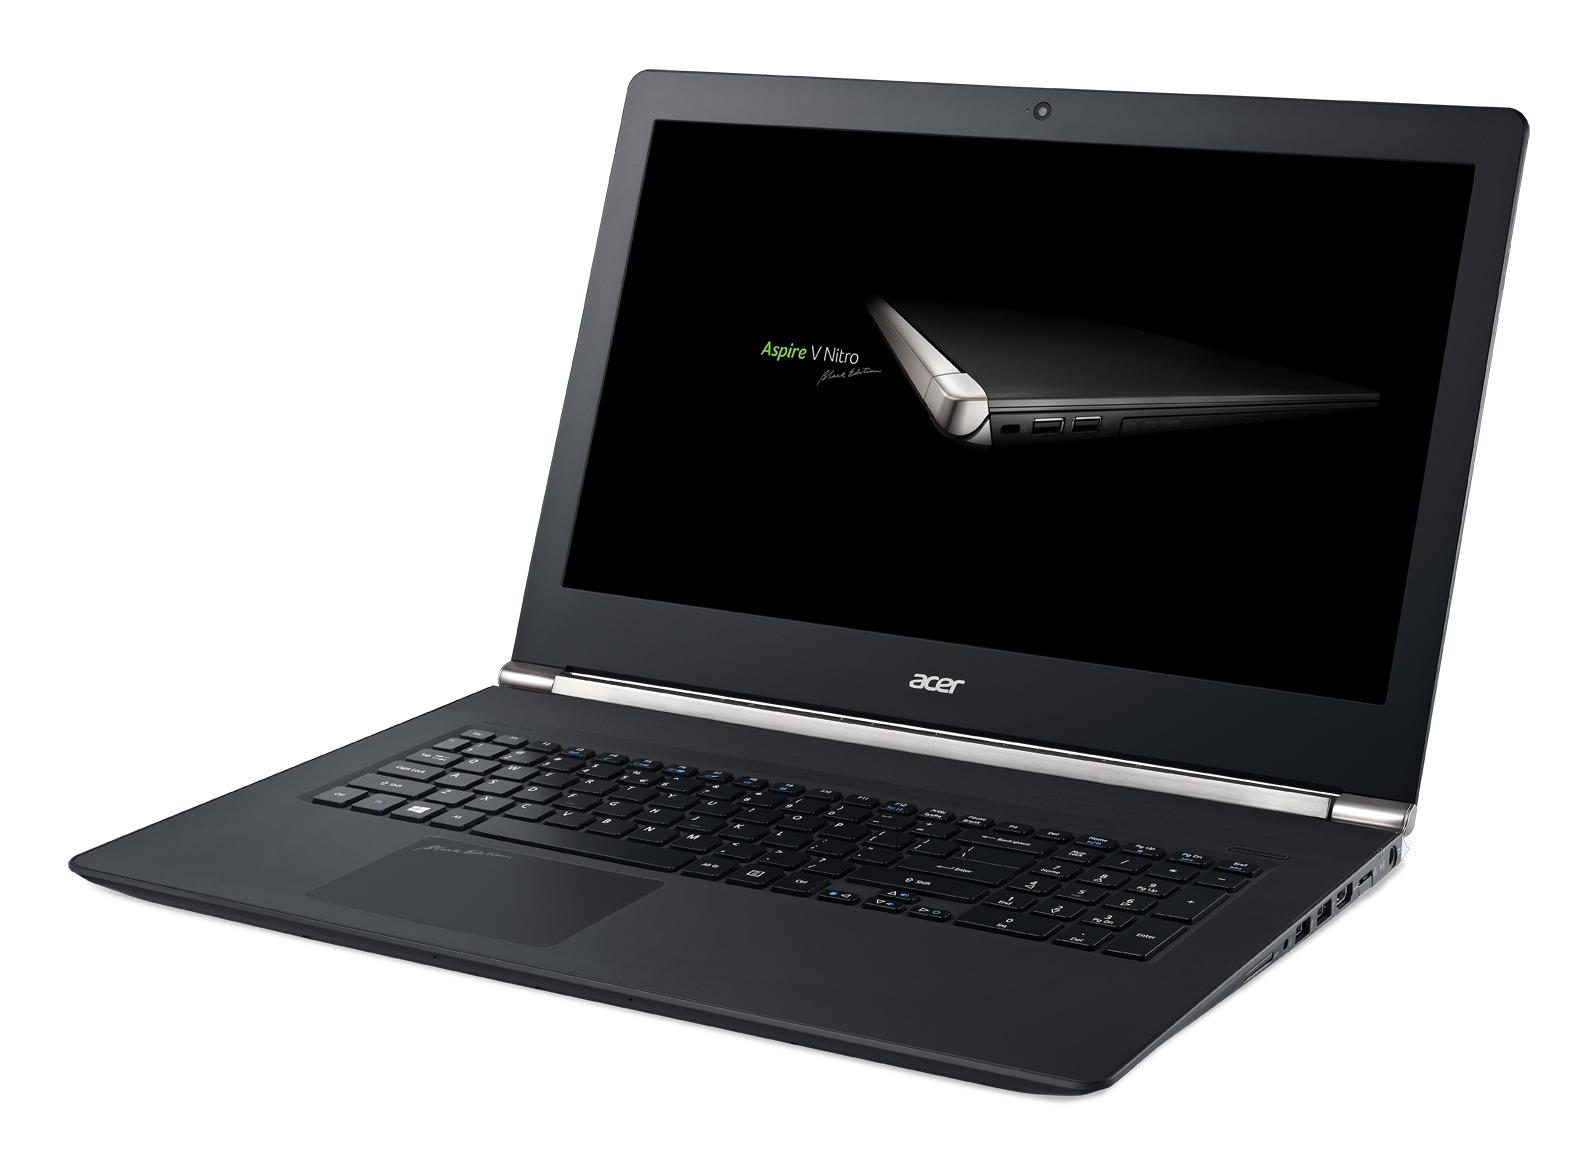 Acer Aspire V Nitro Fires Up Gamers